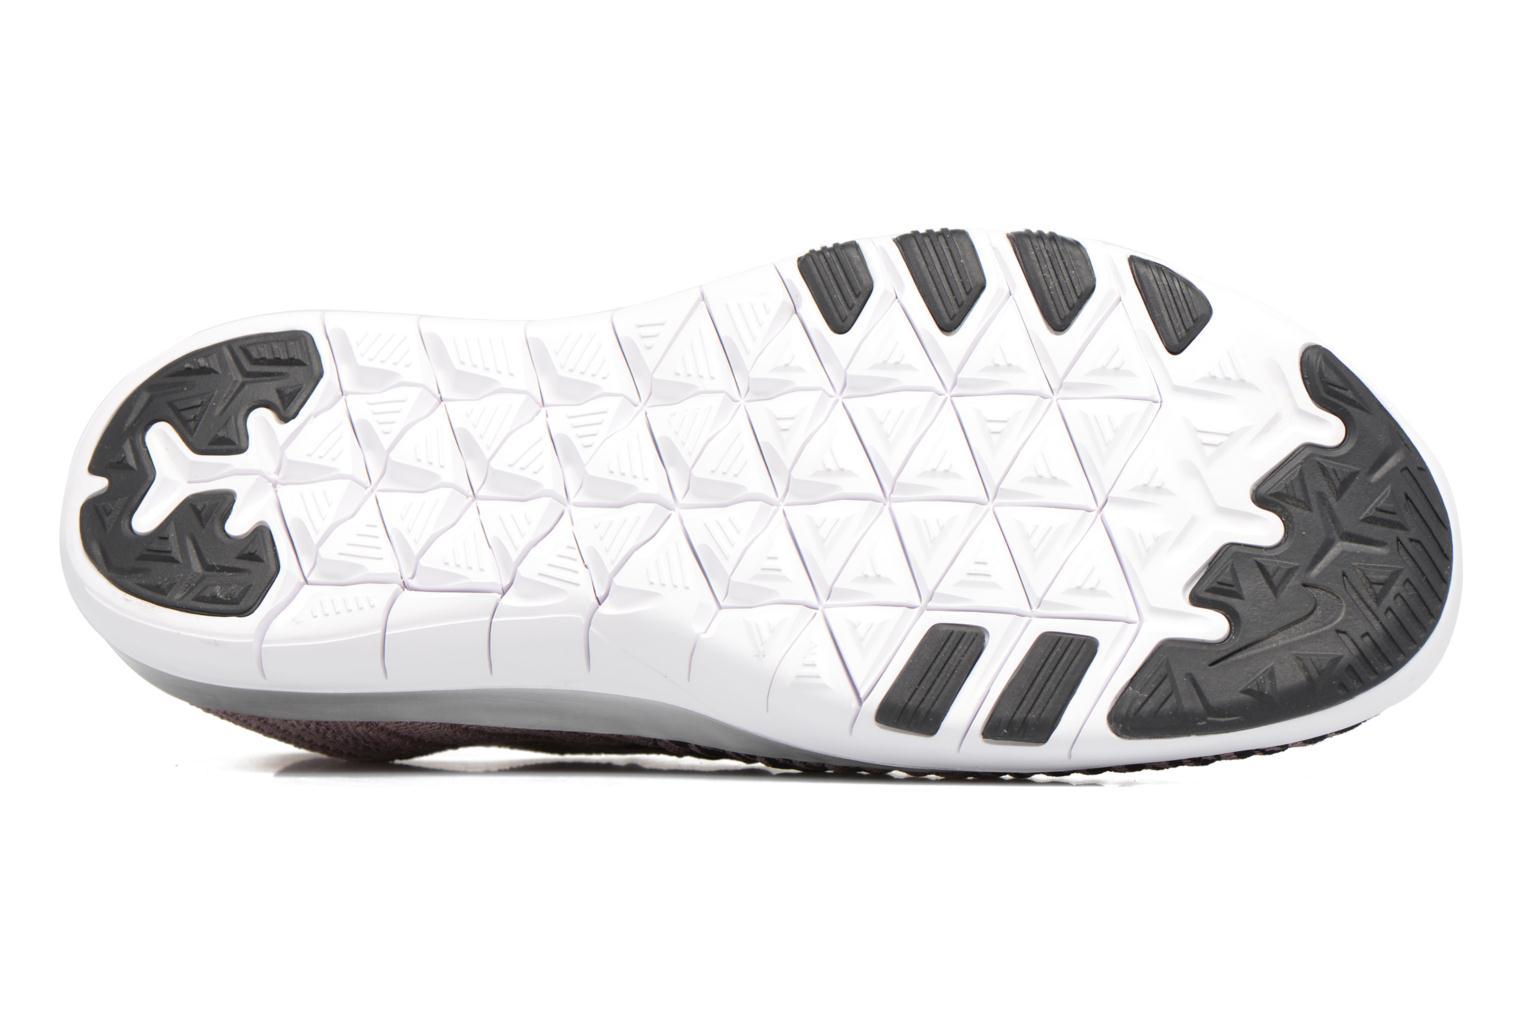 Zapatillas de deporte Nike Wmns Nike Free Tr Fk 2 Bionic Violeta      vista de arriba